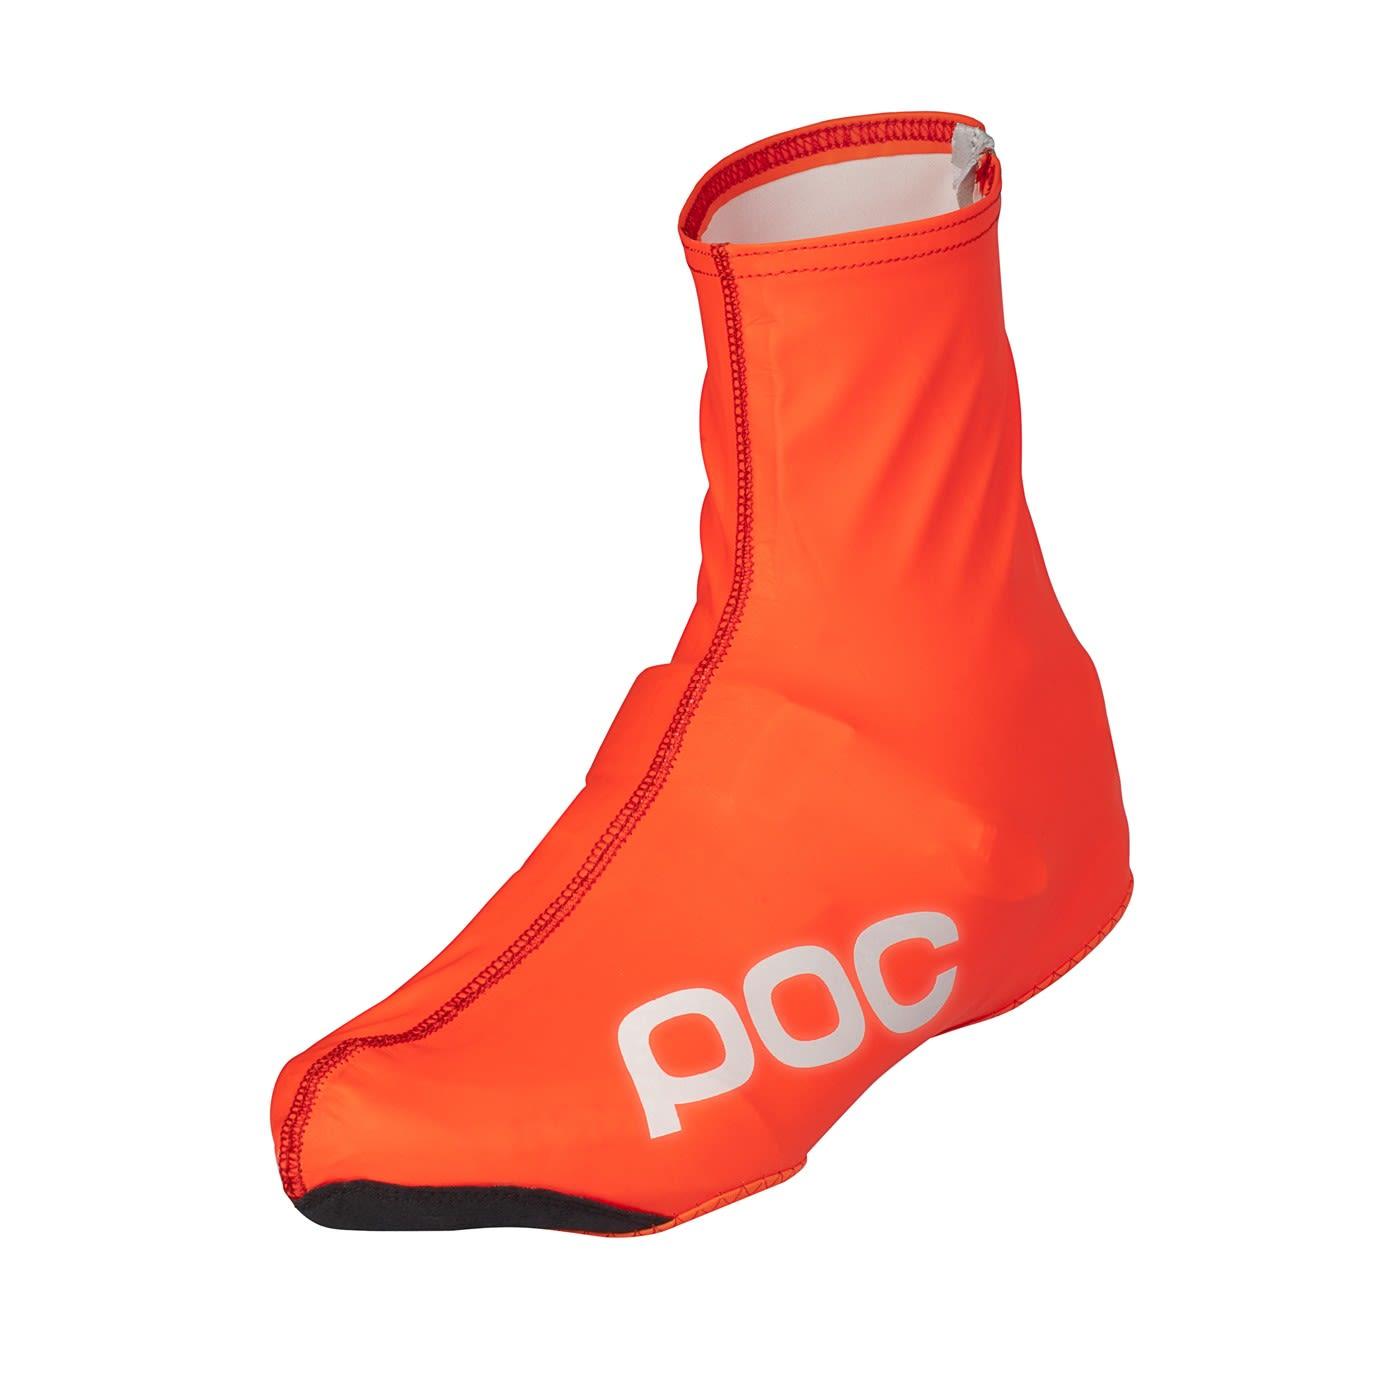 POC Avip Rain Bootie Orange, All-Mountain/Trekking, M